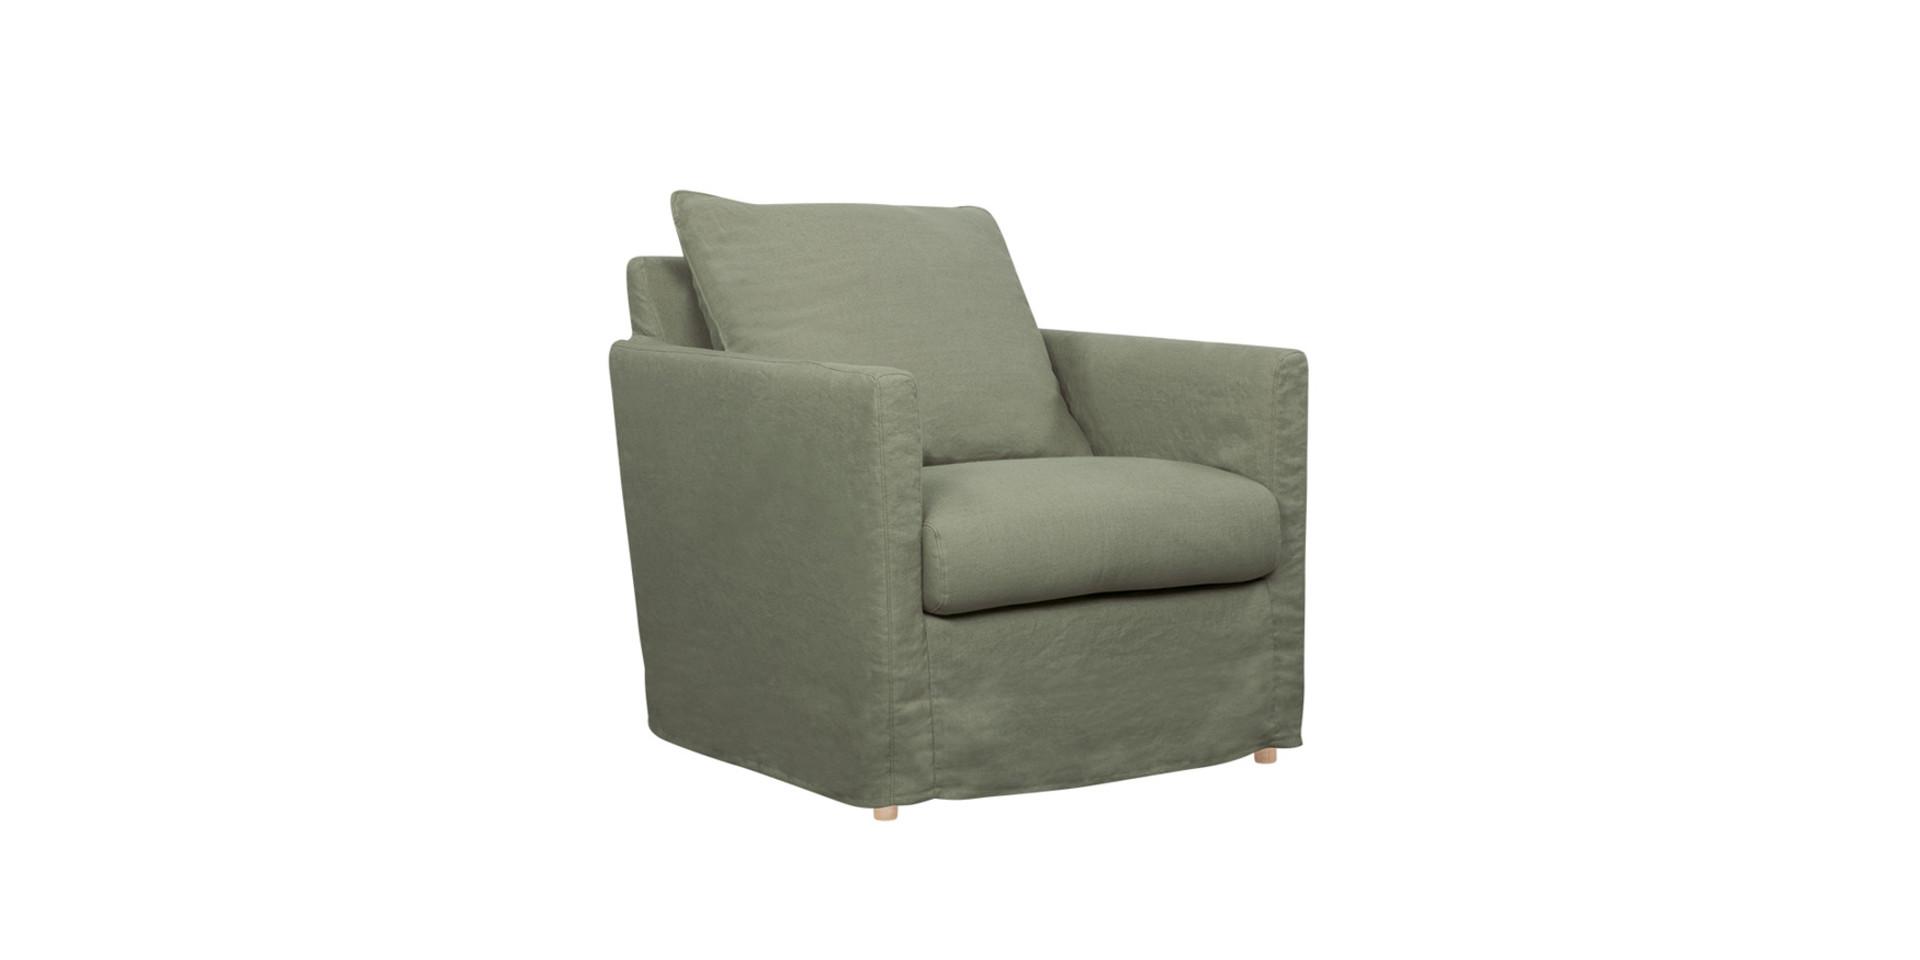 SALLY_armchair_linenP823_9_sage_2